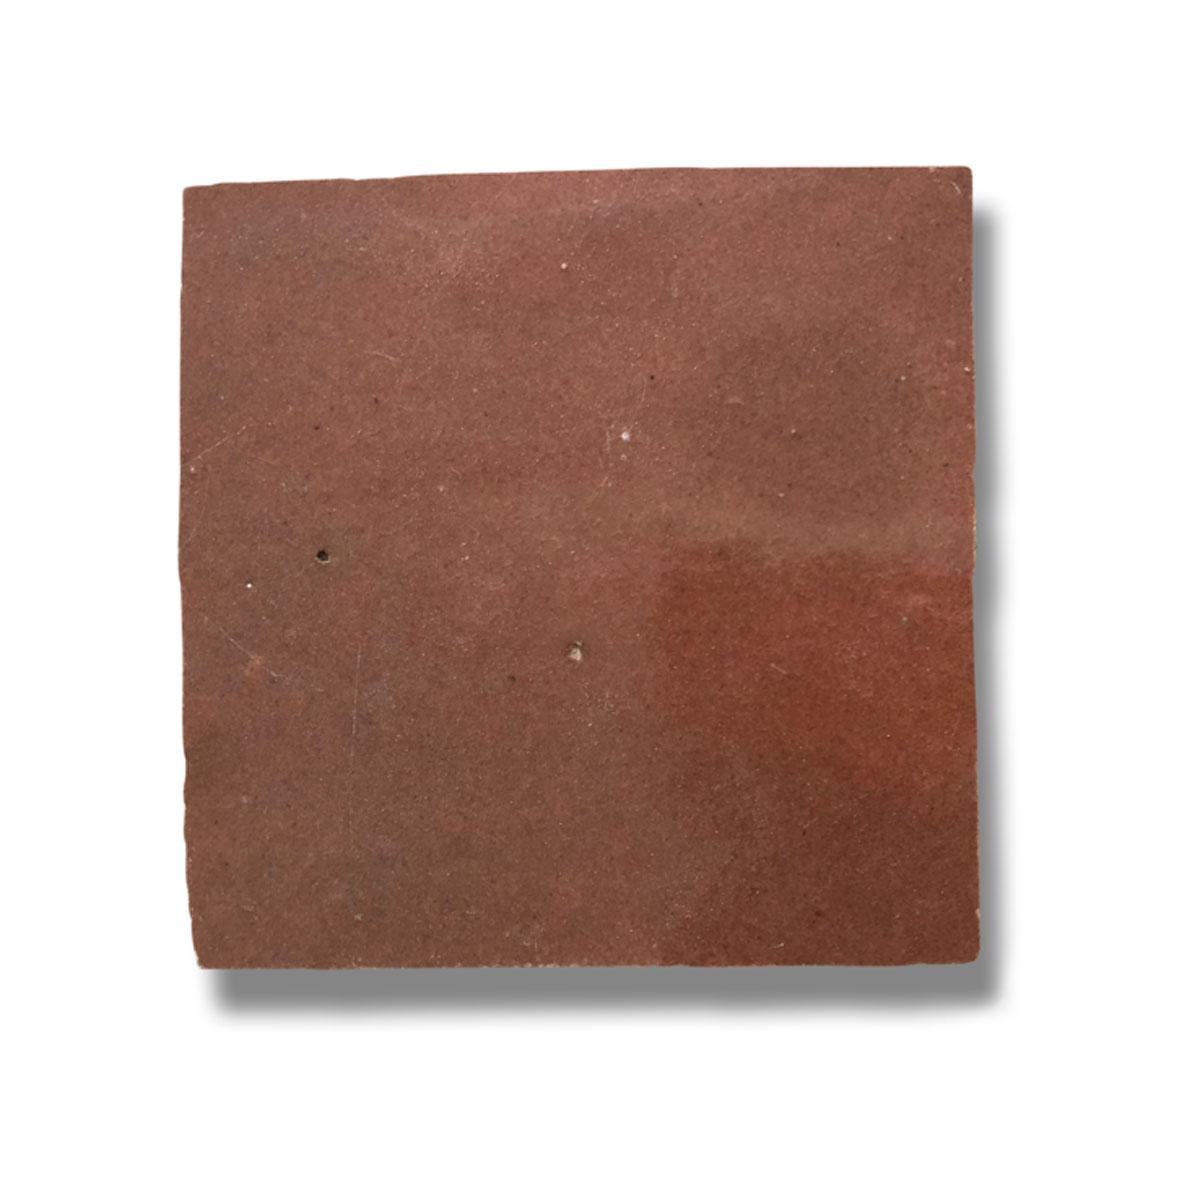 Clay Zellige - Rust - Moroccan feature tiles - Stone3 Brisbane